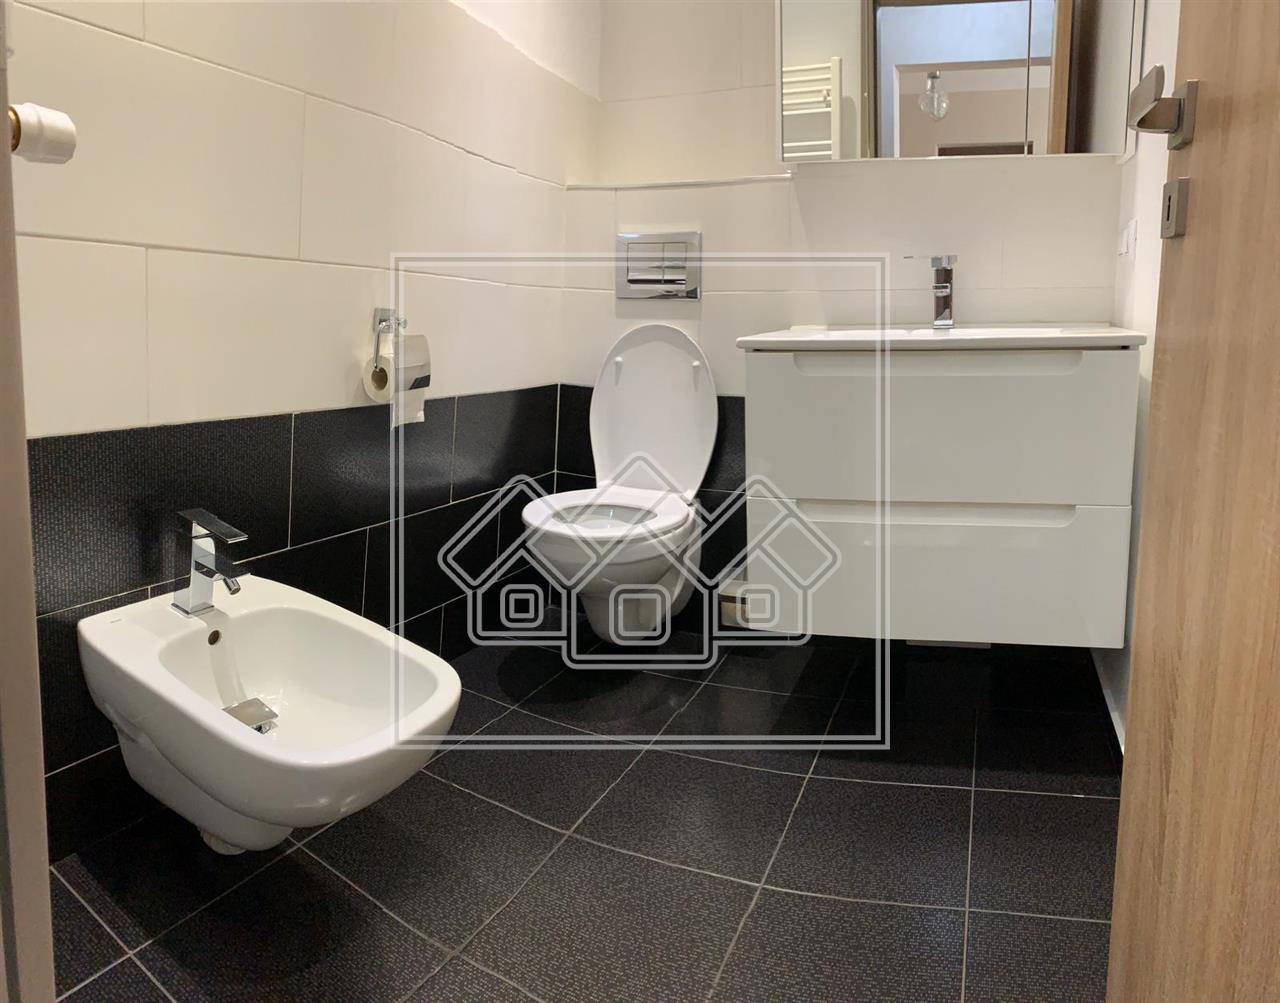 Apartament de inchiriat in Sibiu -4 camere- mobilat si utilat